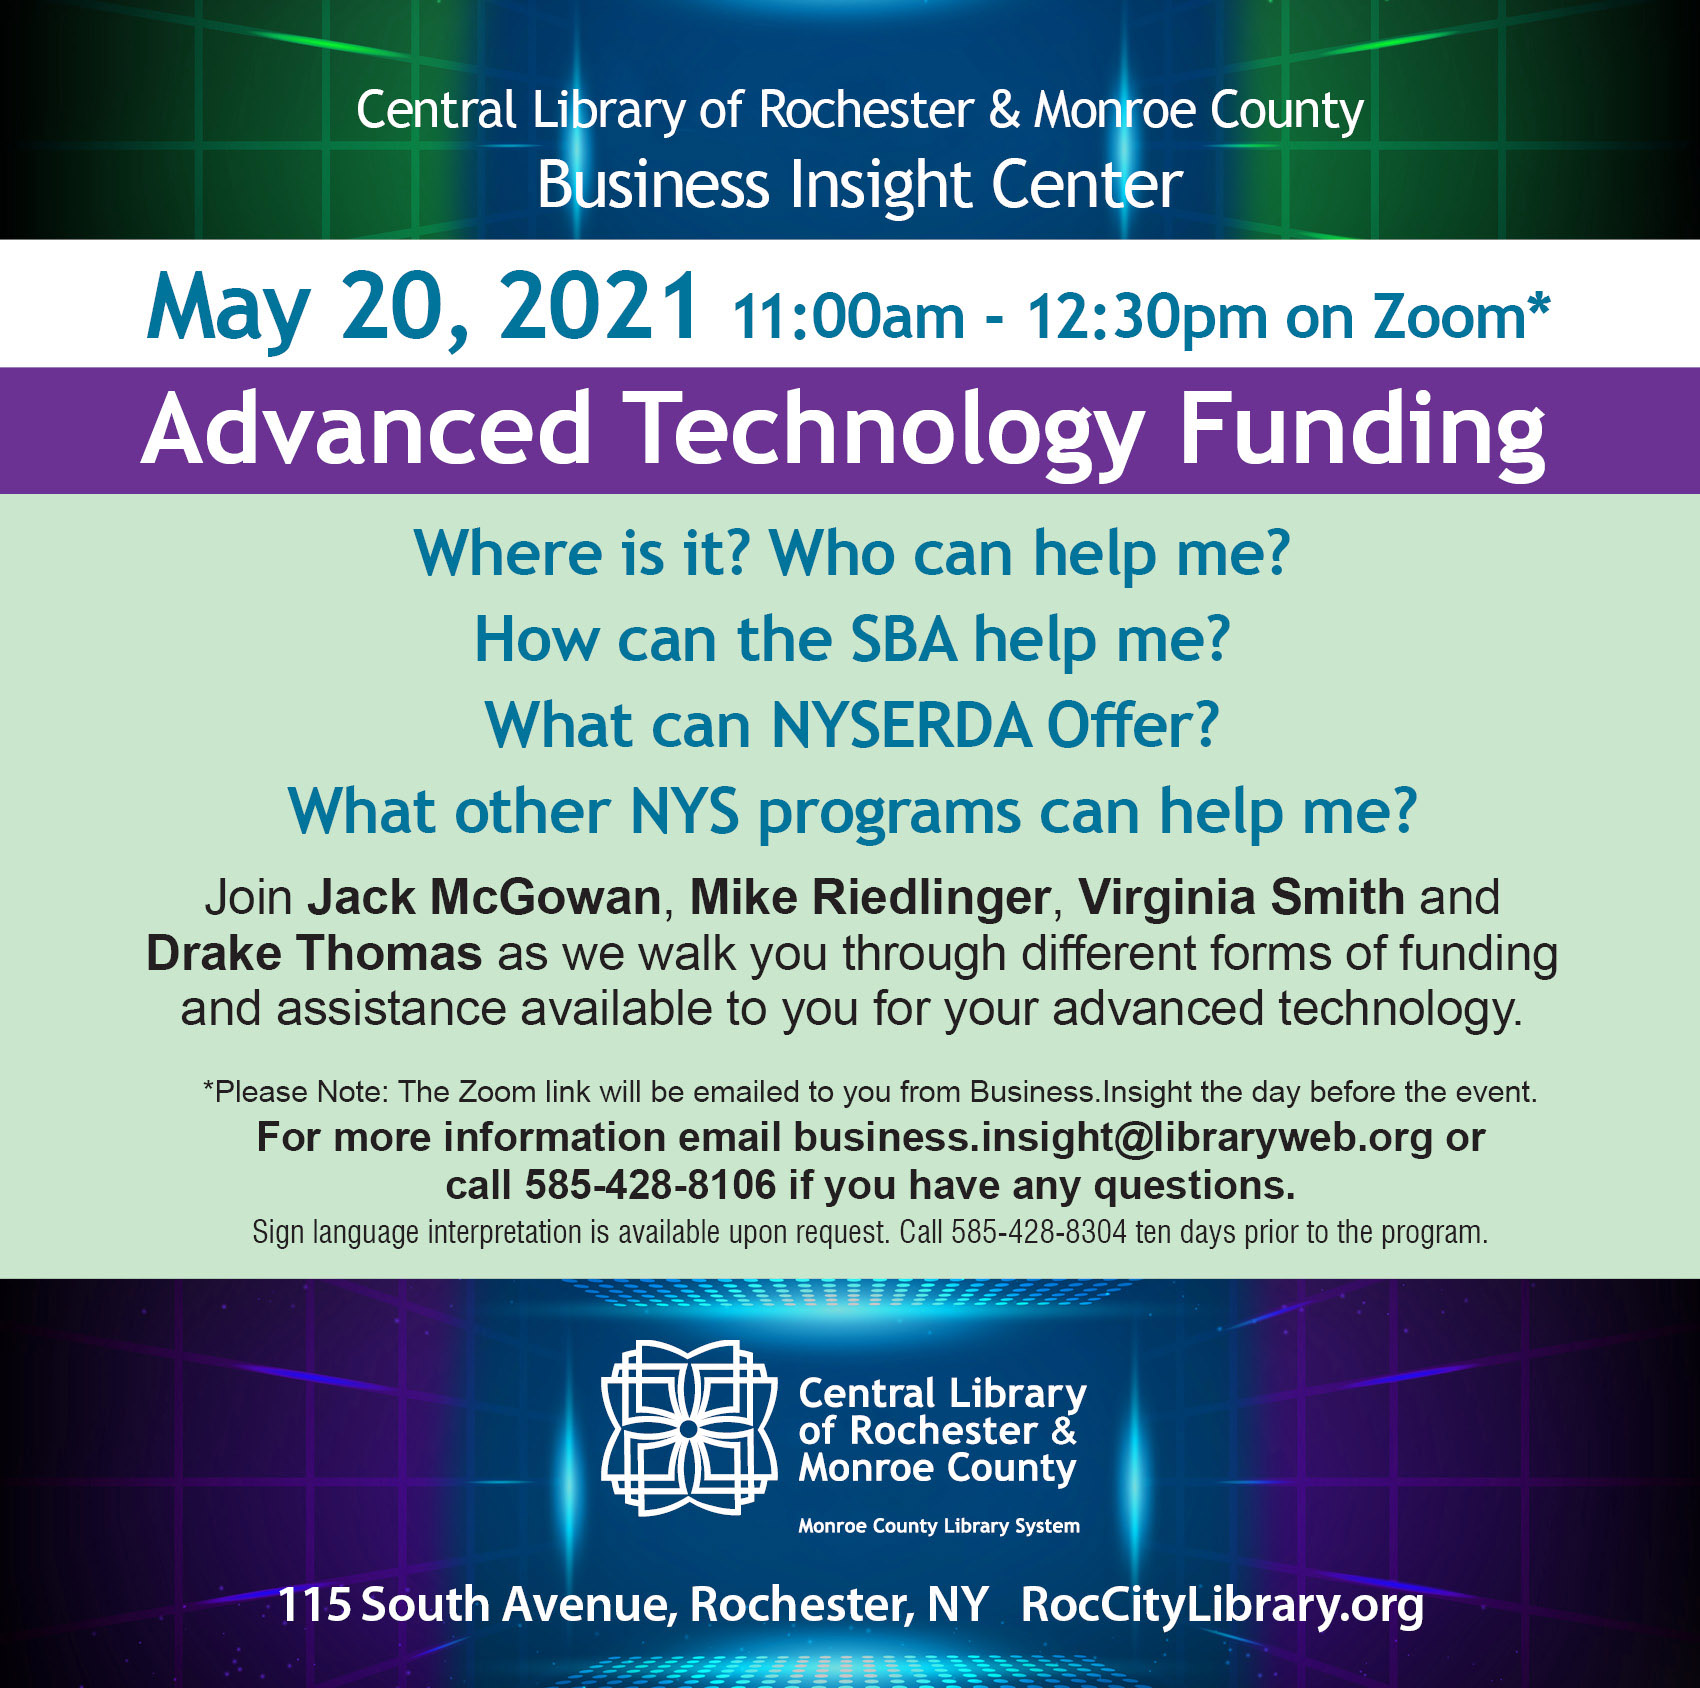 Advanced Technology Funding